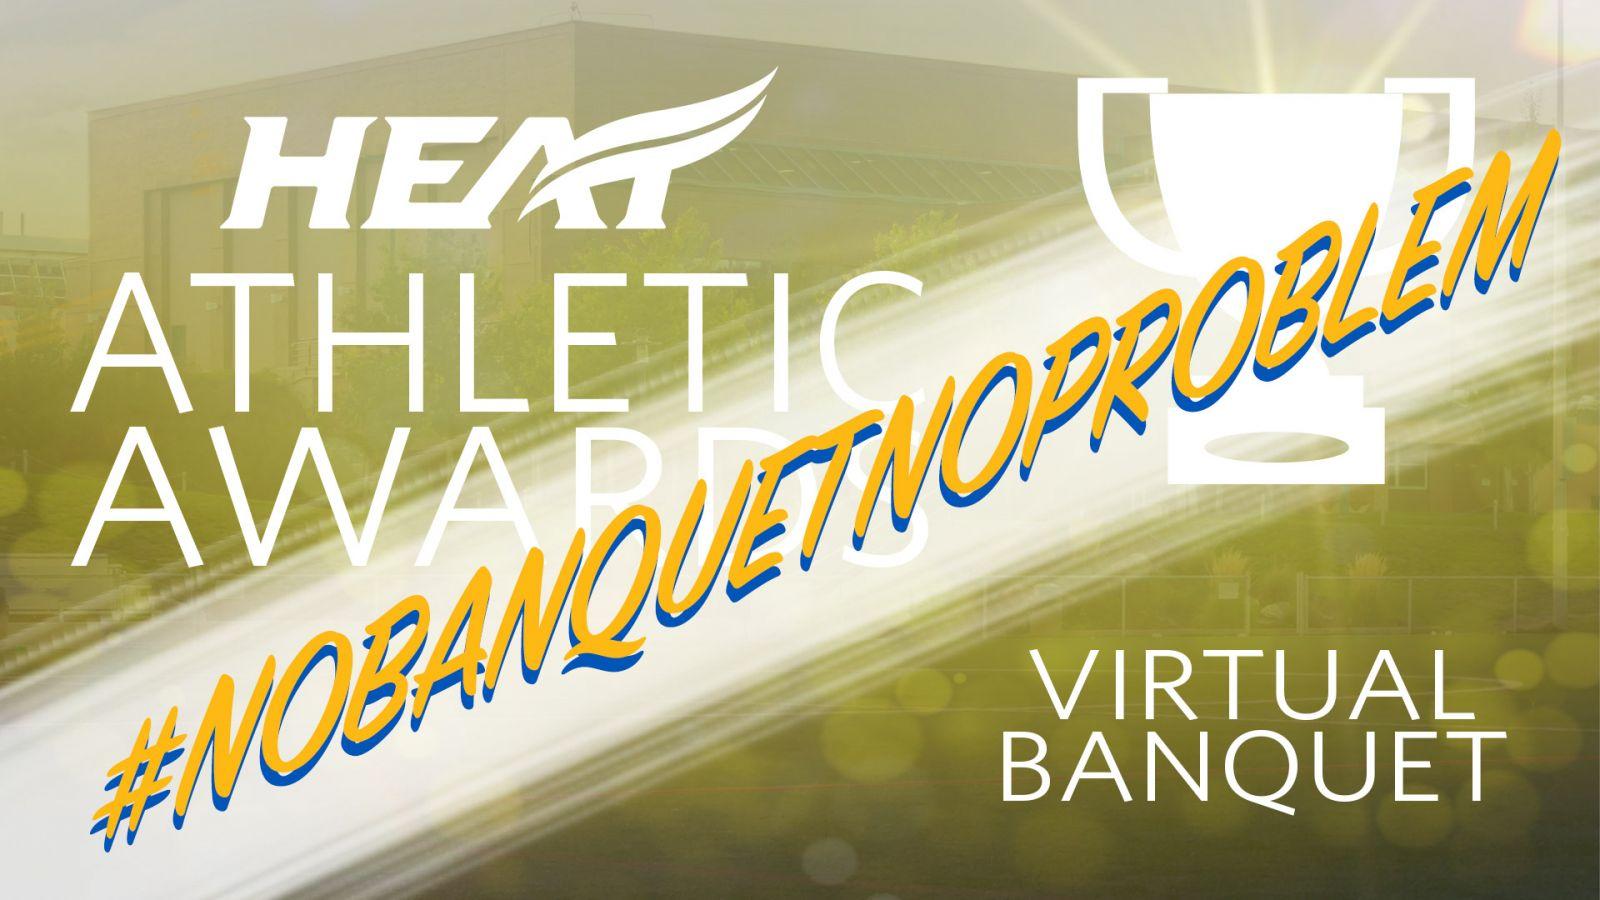 Heat athletic award virtual banquet